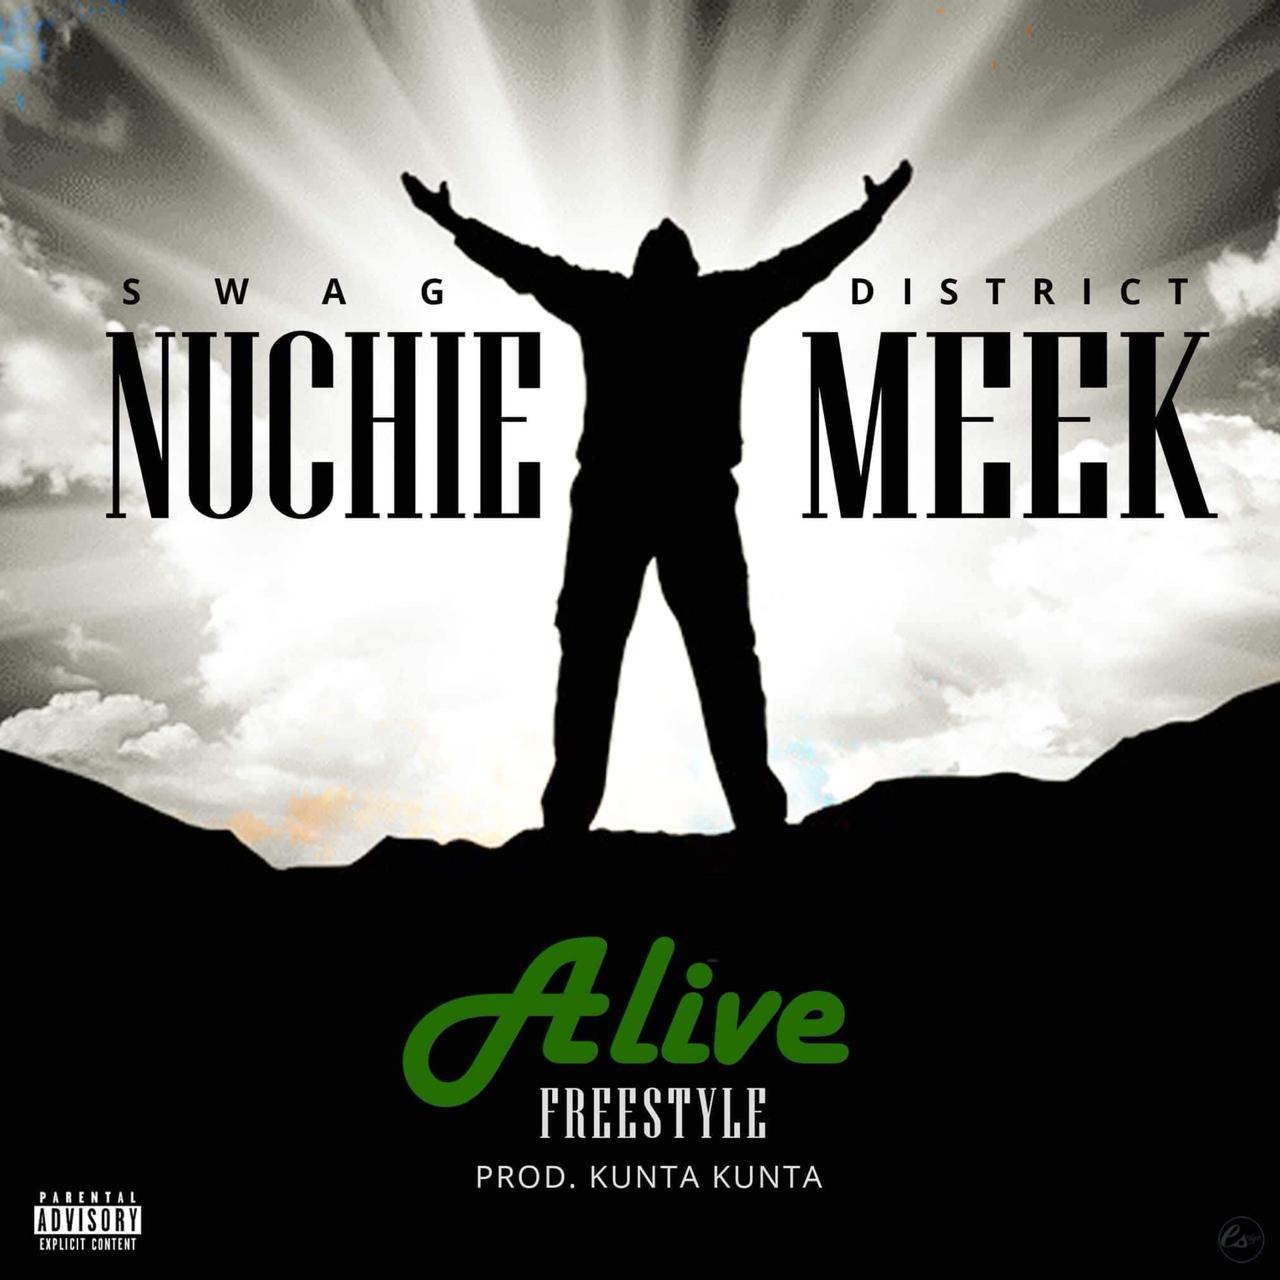 Nuchie-Meek-Alive-Freestyle-Prod.-Kunta.jpg